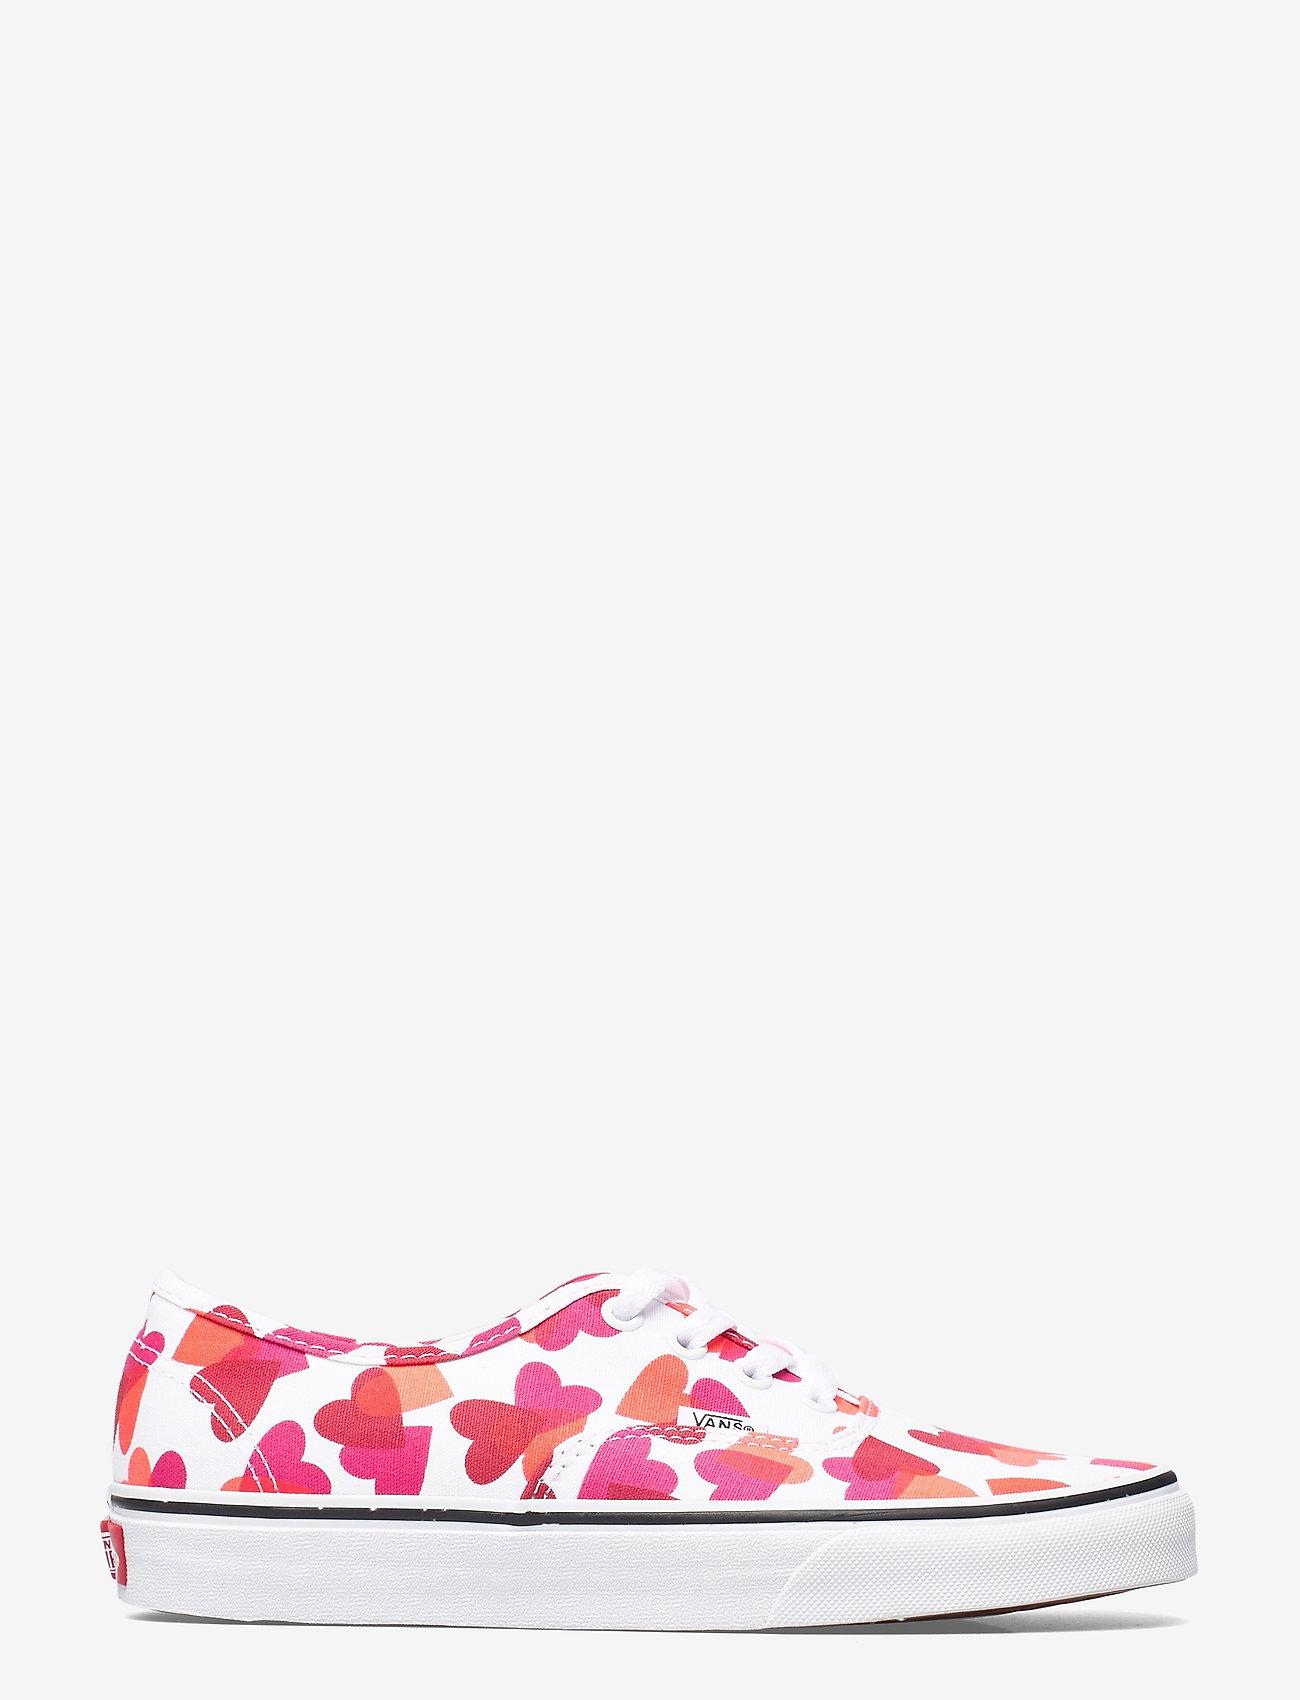 VANS - UA Authentic - lage sneakers - (valntnshrts)trwhtfchsprp - 1